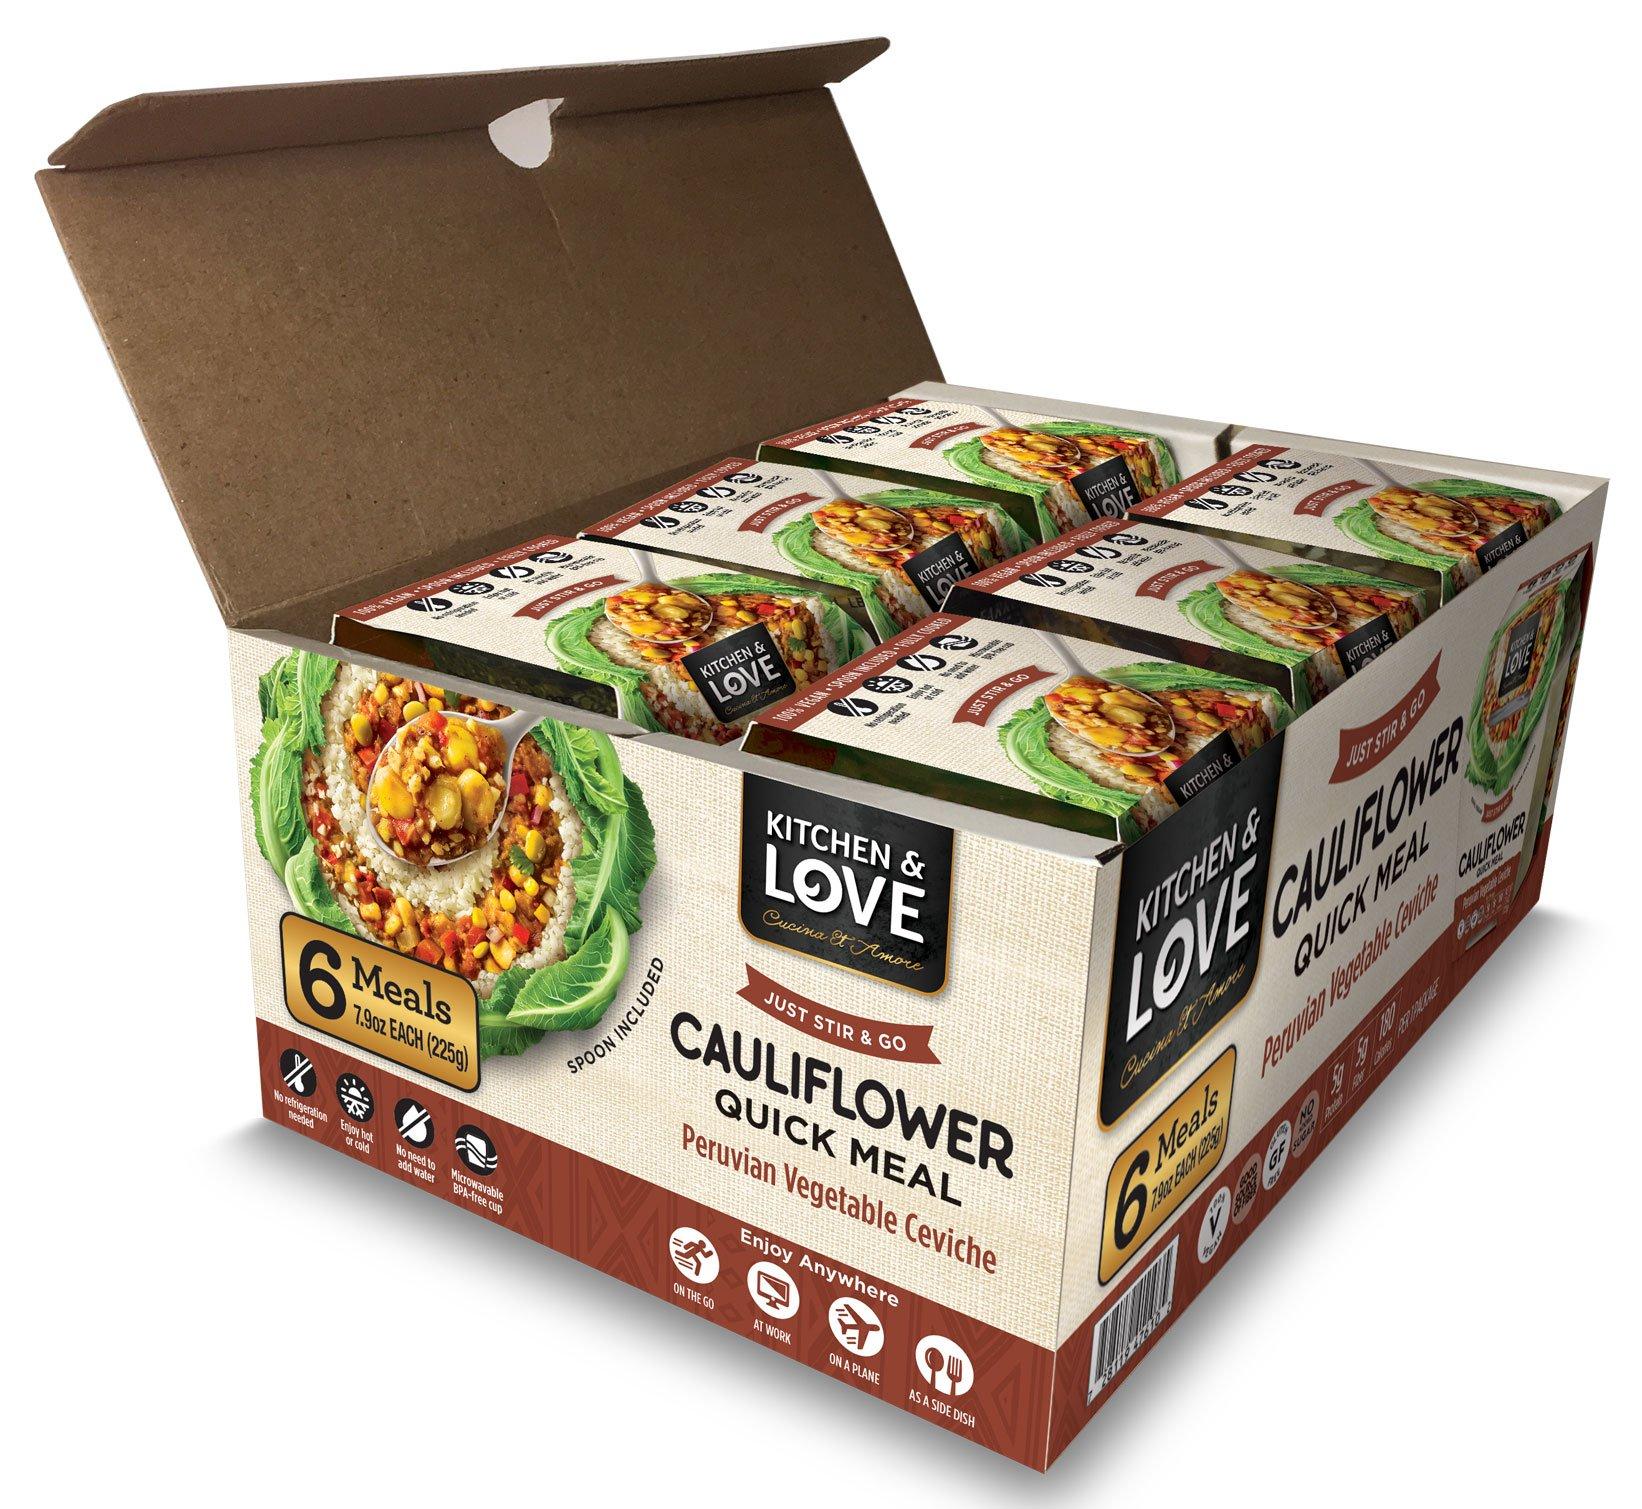 Kitchen & Love Peruvian Vegetable Ceviche Cauliflower Quick Meal 6 Pack by Kitchen & Love